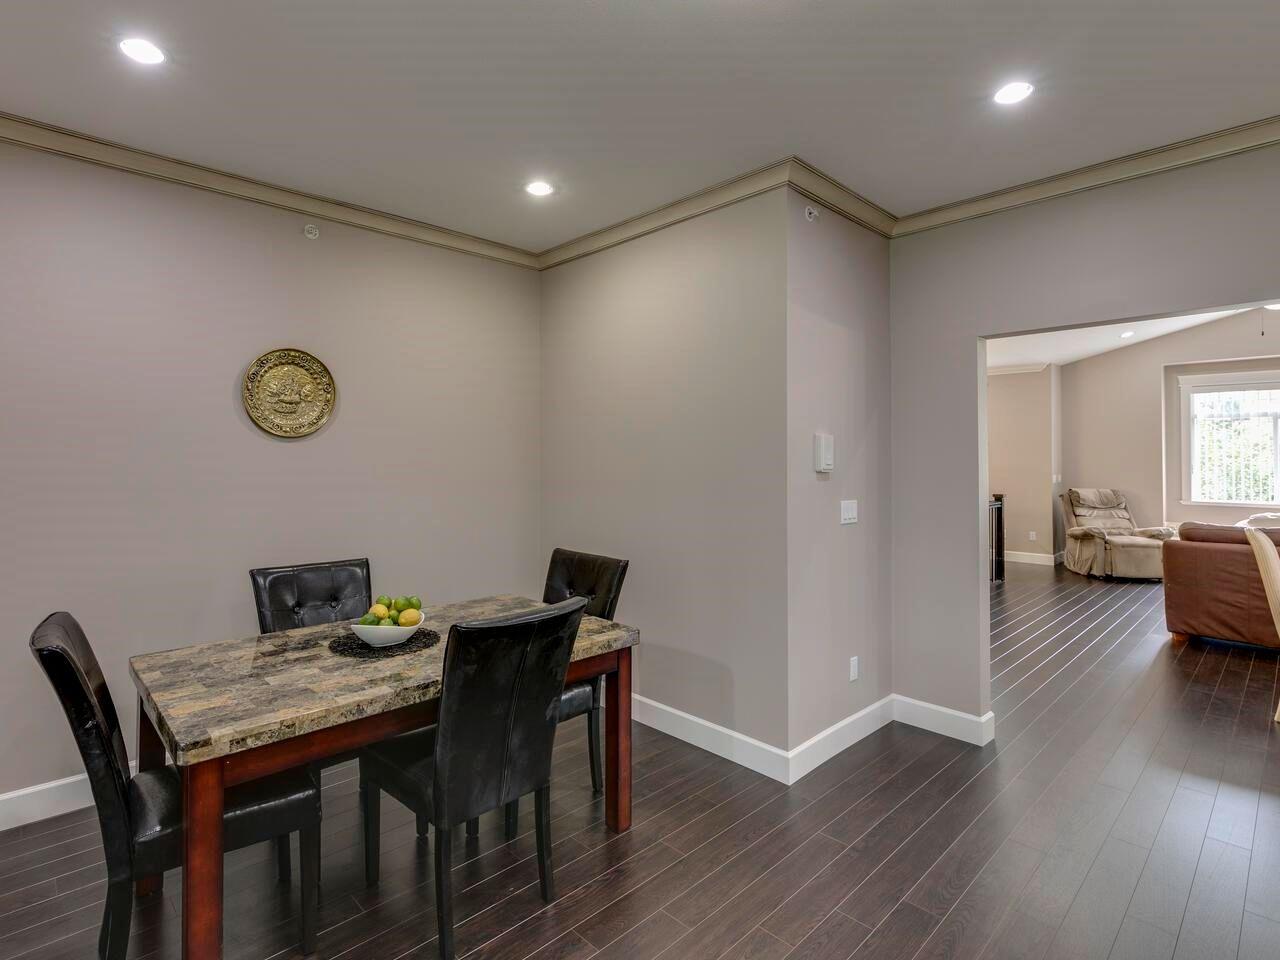 "Photo 13: Photos: 22845 126B Avenue in Maple Ridge: East Central House for sale in ""EAST CENTRAL MAPLE RIDGE"" : MLS®# R2594638"